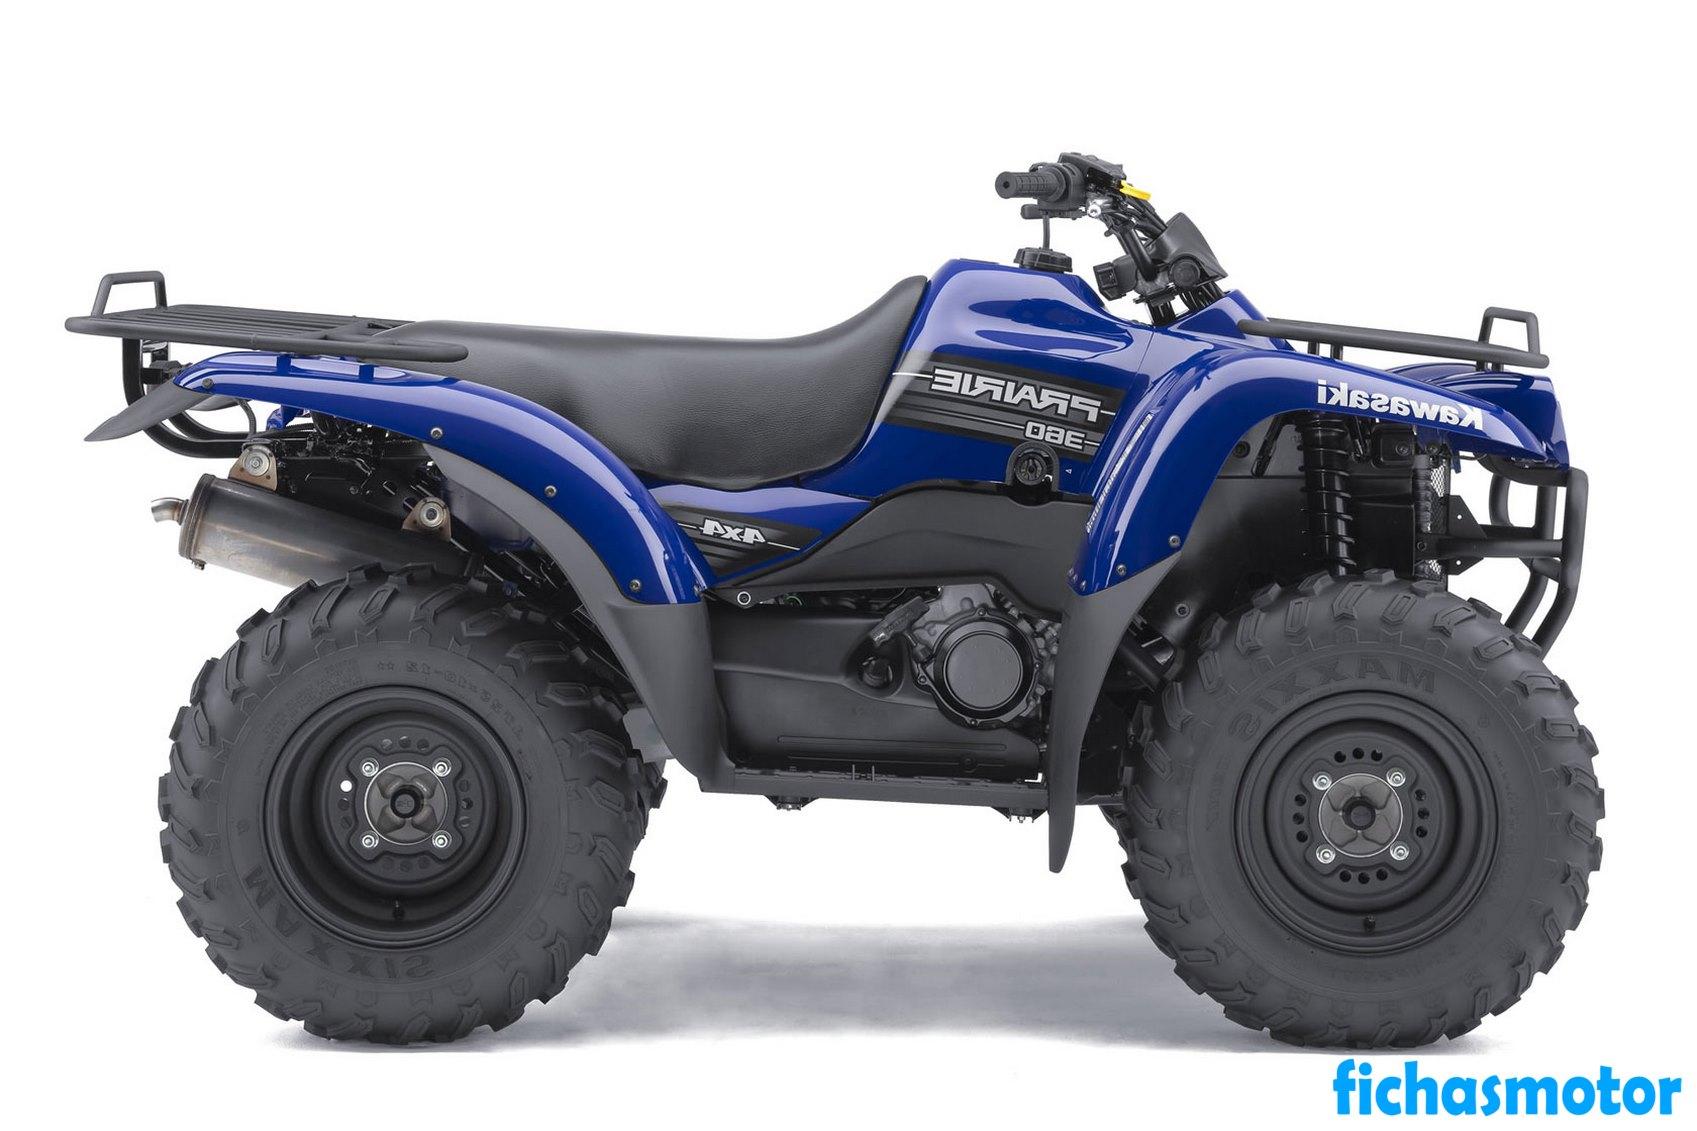 Imagen moto Kawasaki Prairie 360 4x4 año 2011